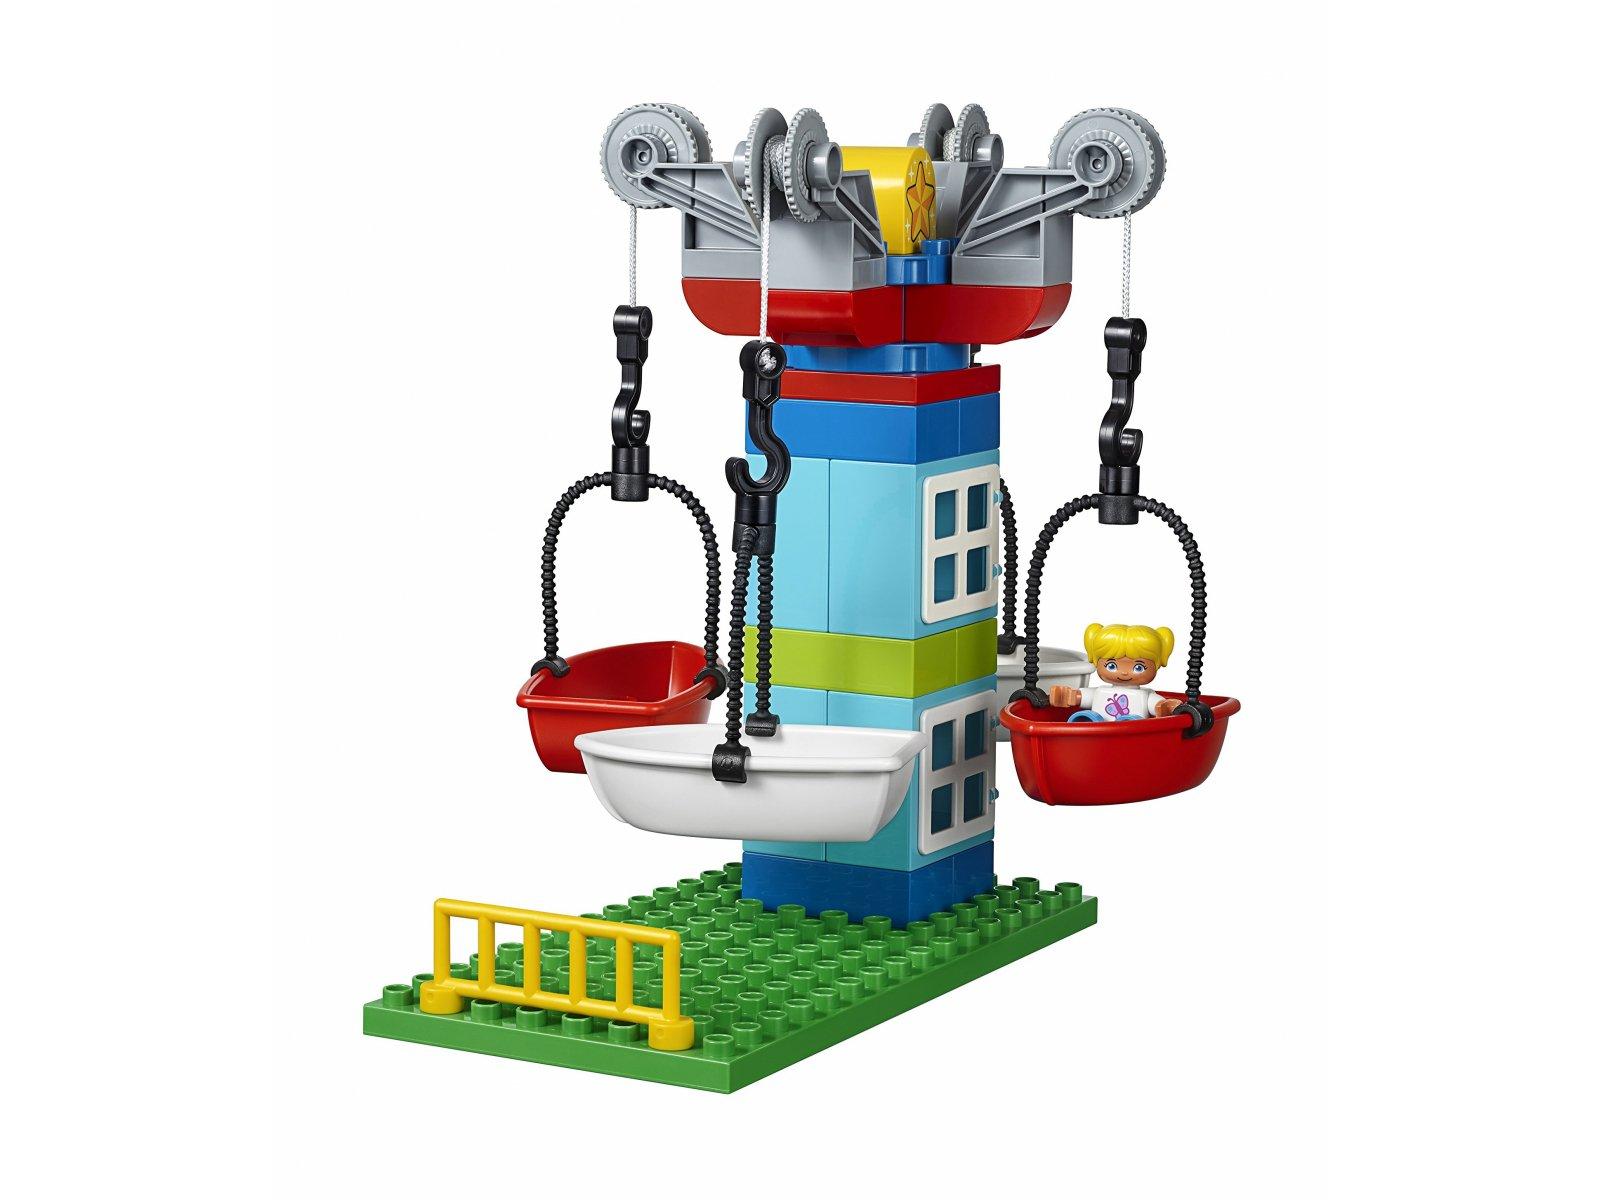 LEGO 45024 STEAM Park